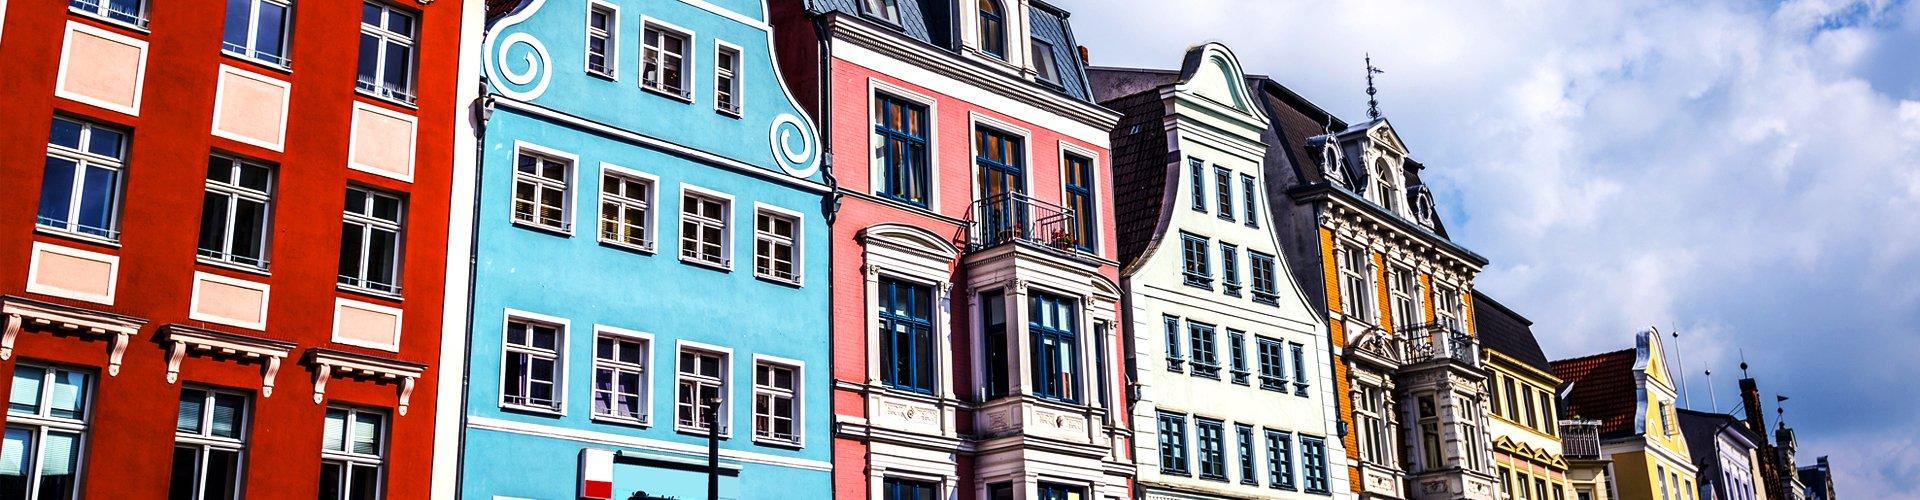 Rostock in Duitsland